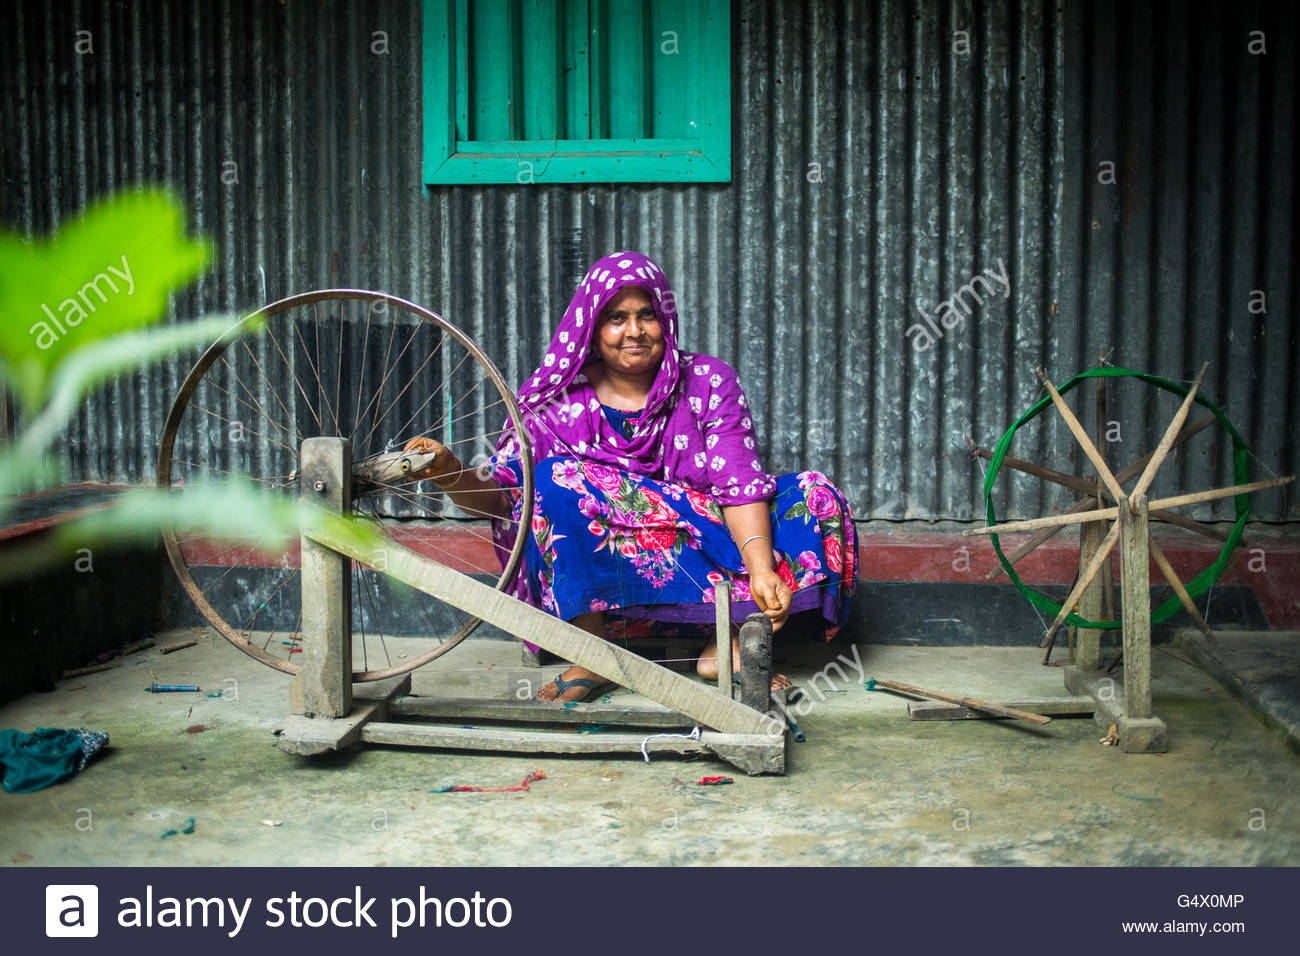 a women waving yarn  to make traditional saree in Tangail,Bangladesh. - Stock Image